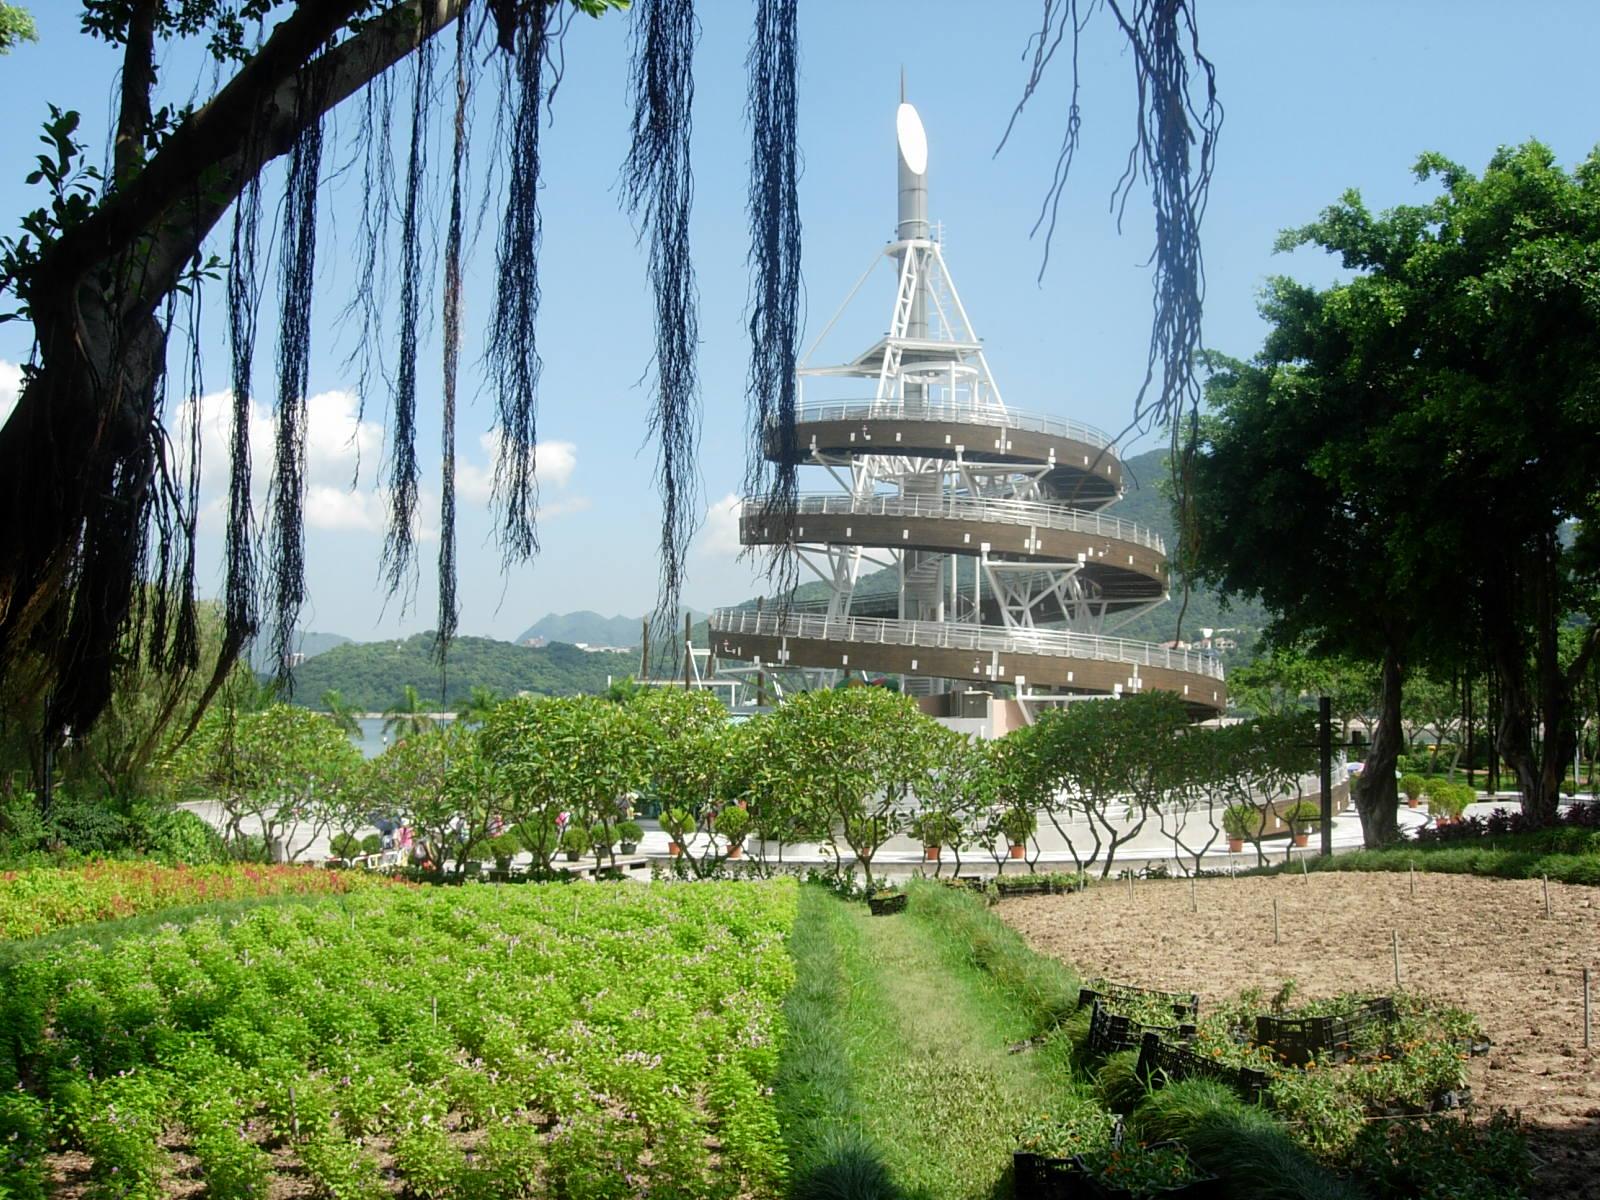 All from the world: 大埔海濱公園